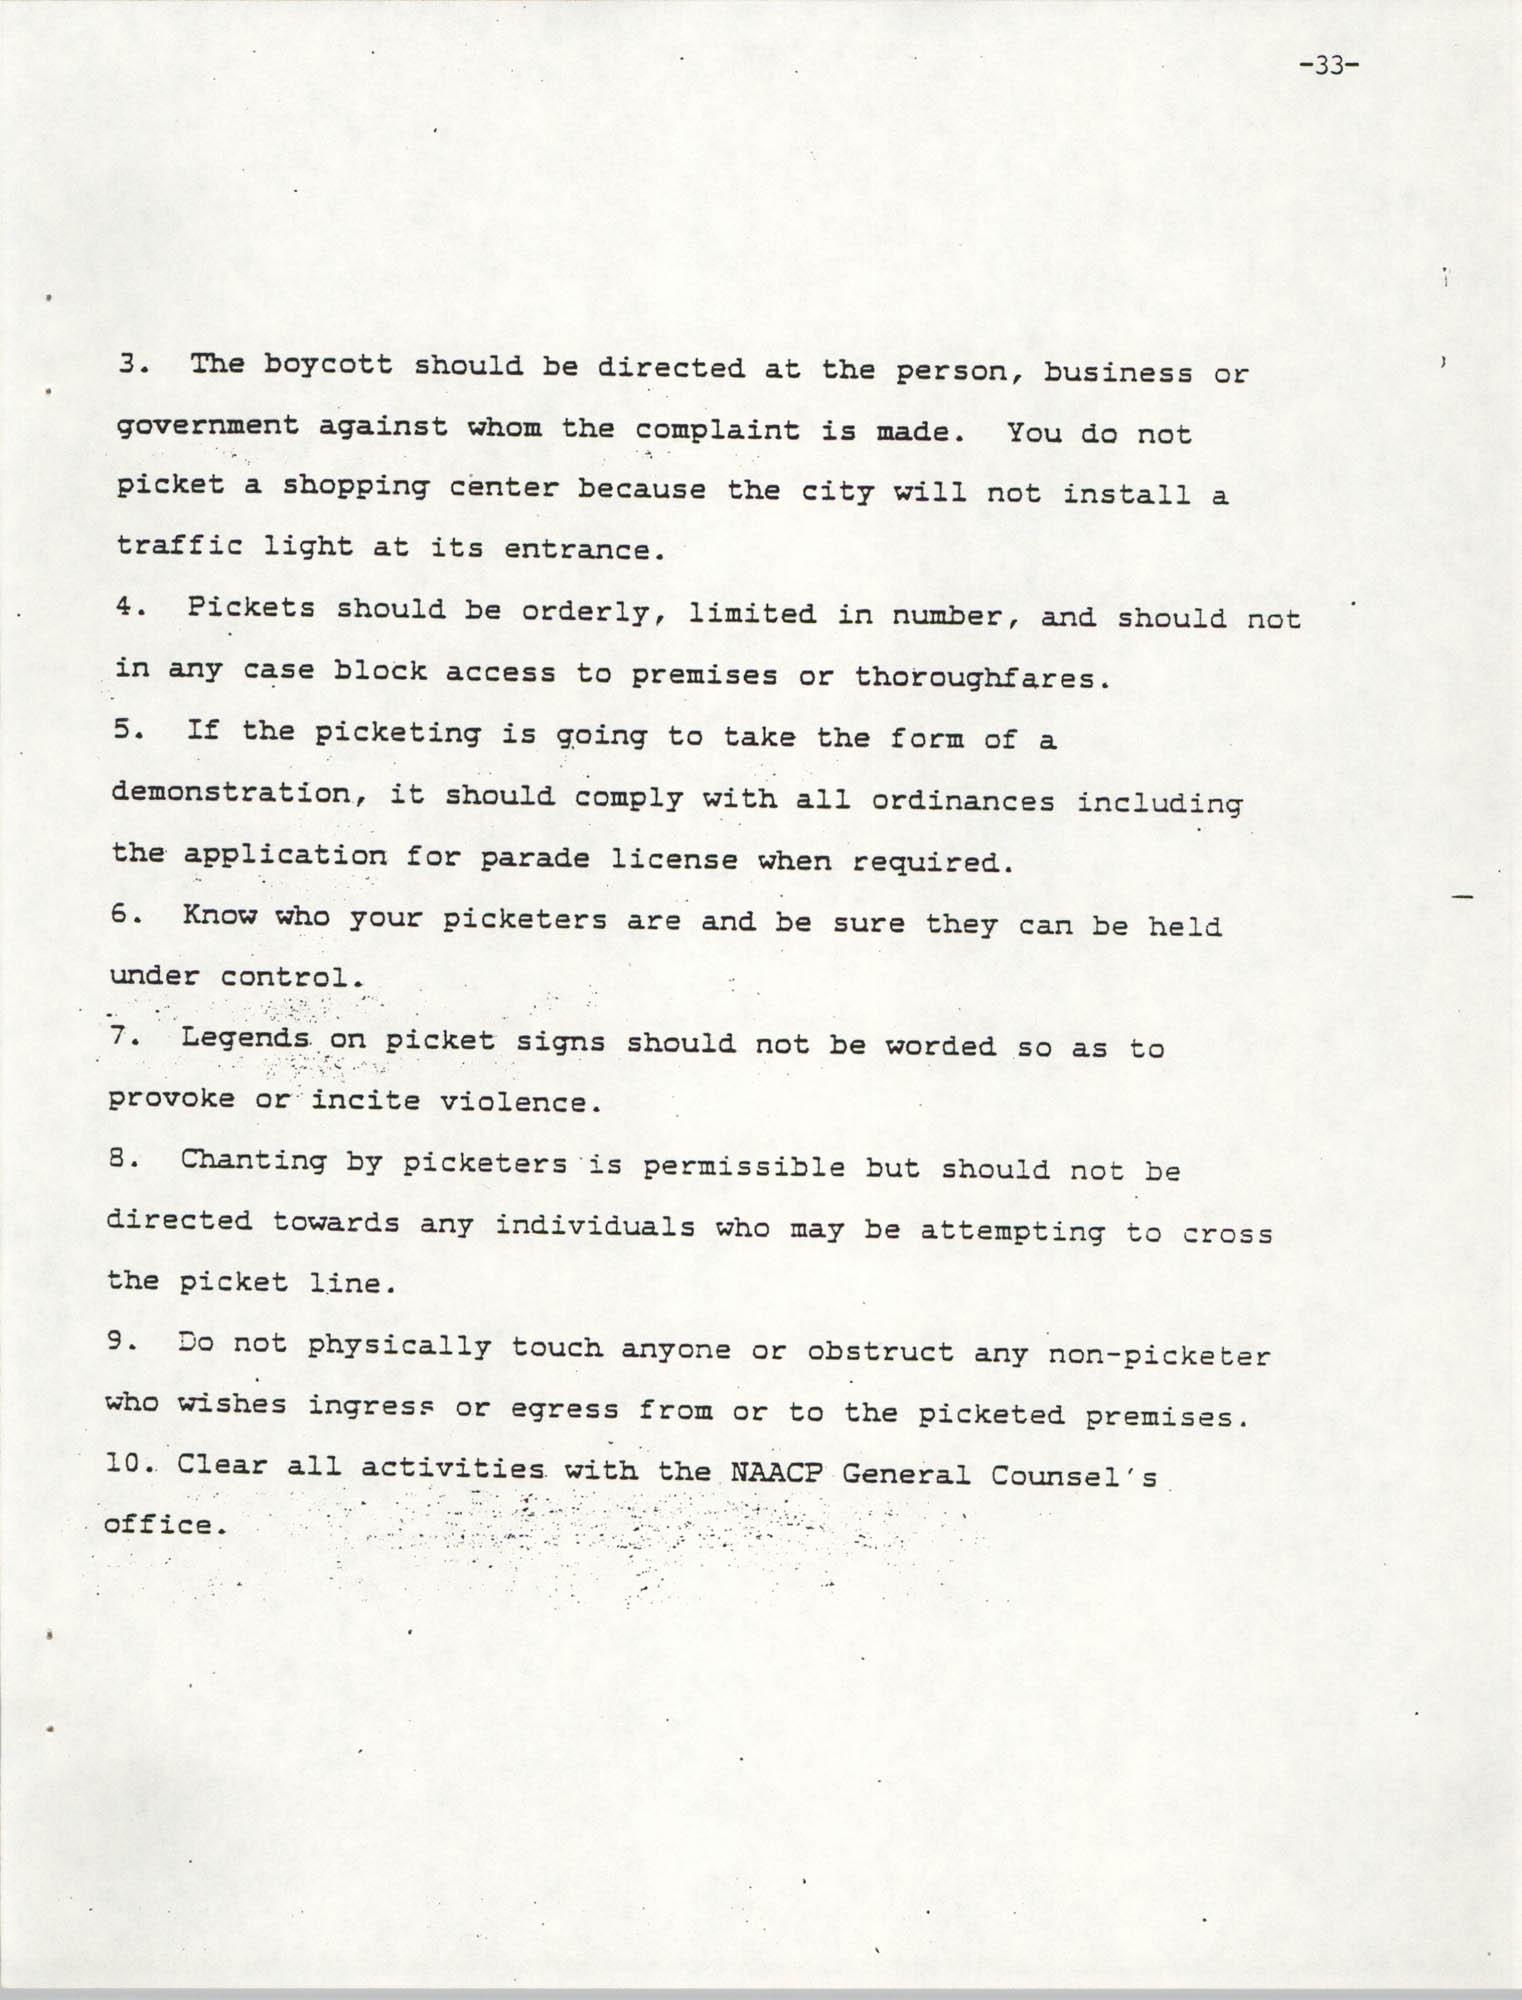 NAACP Mandatory Training Handbook, 1989, Page 33